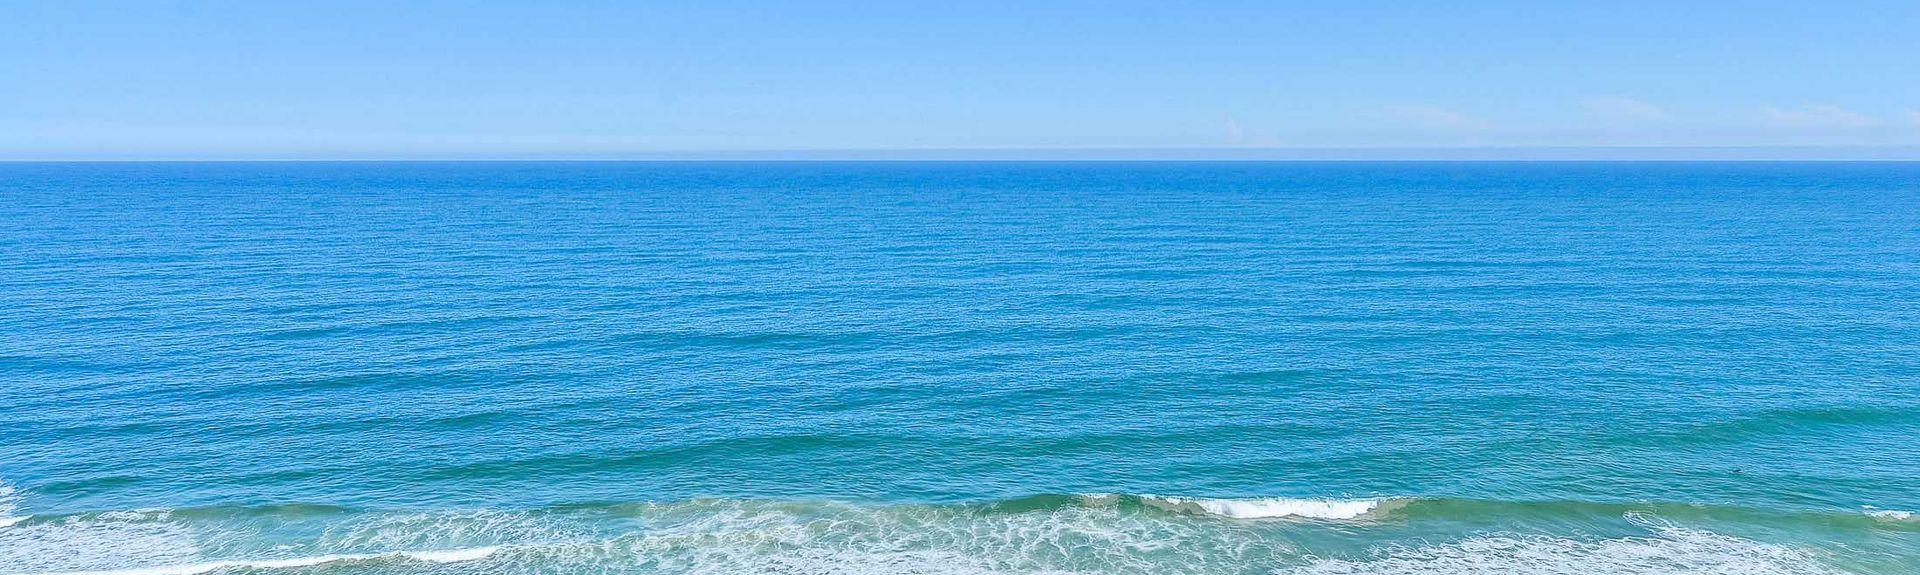 Atlantis, Ocean City, Maryland, United States of America